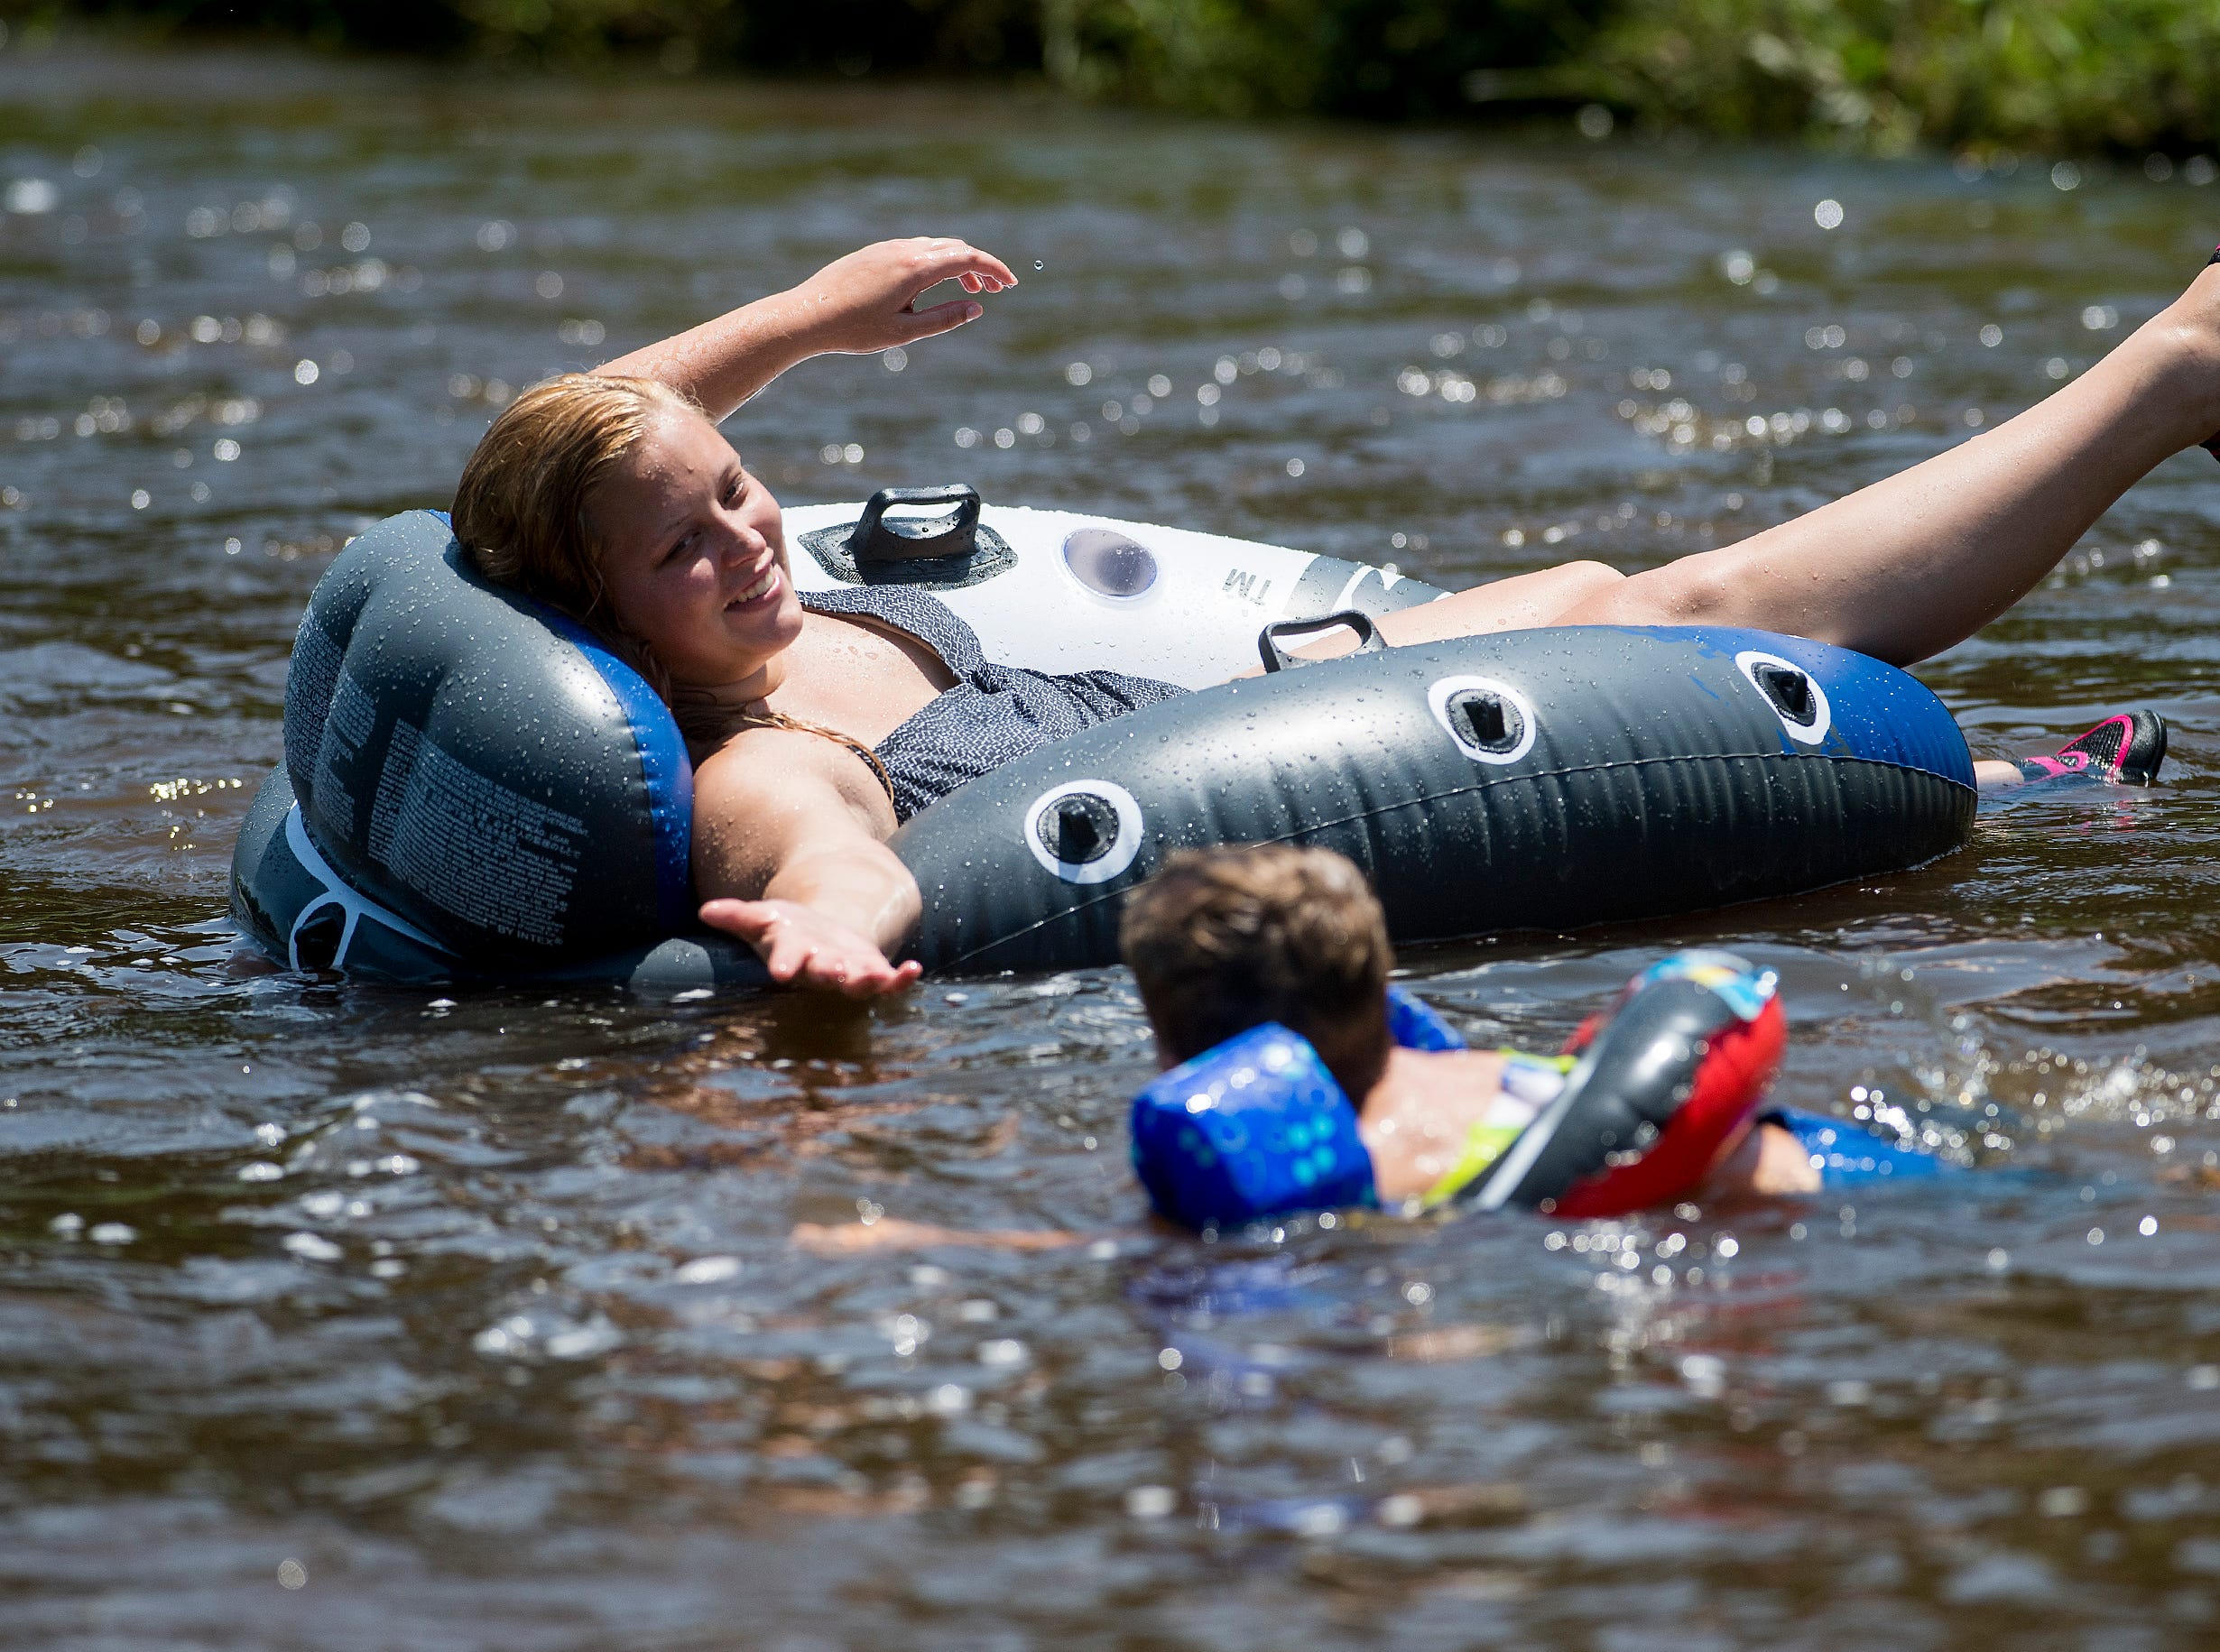 Karson Smith and Sawyers Sims float on Autauga Creek in Prattville, Ala., on Saturday, July 21, 2018.